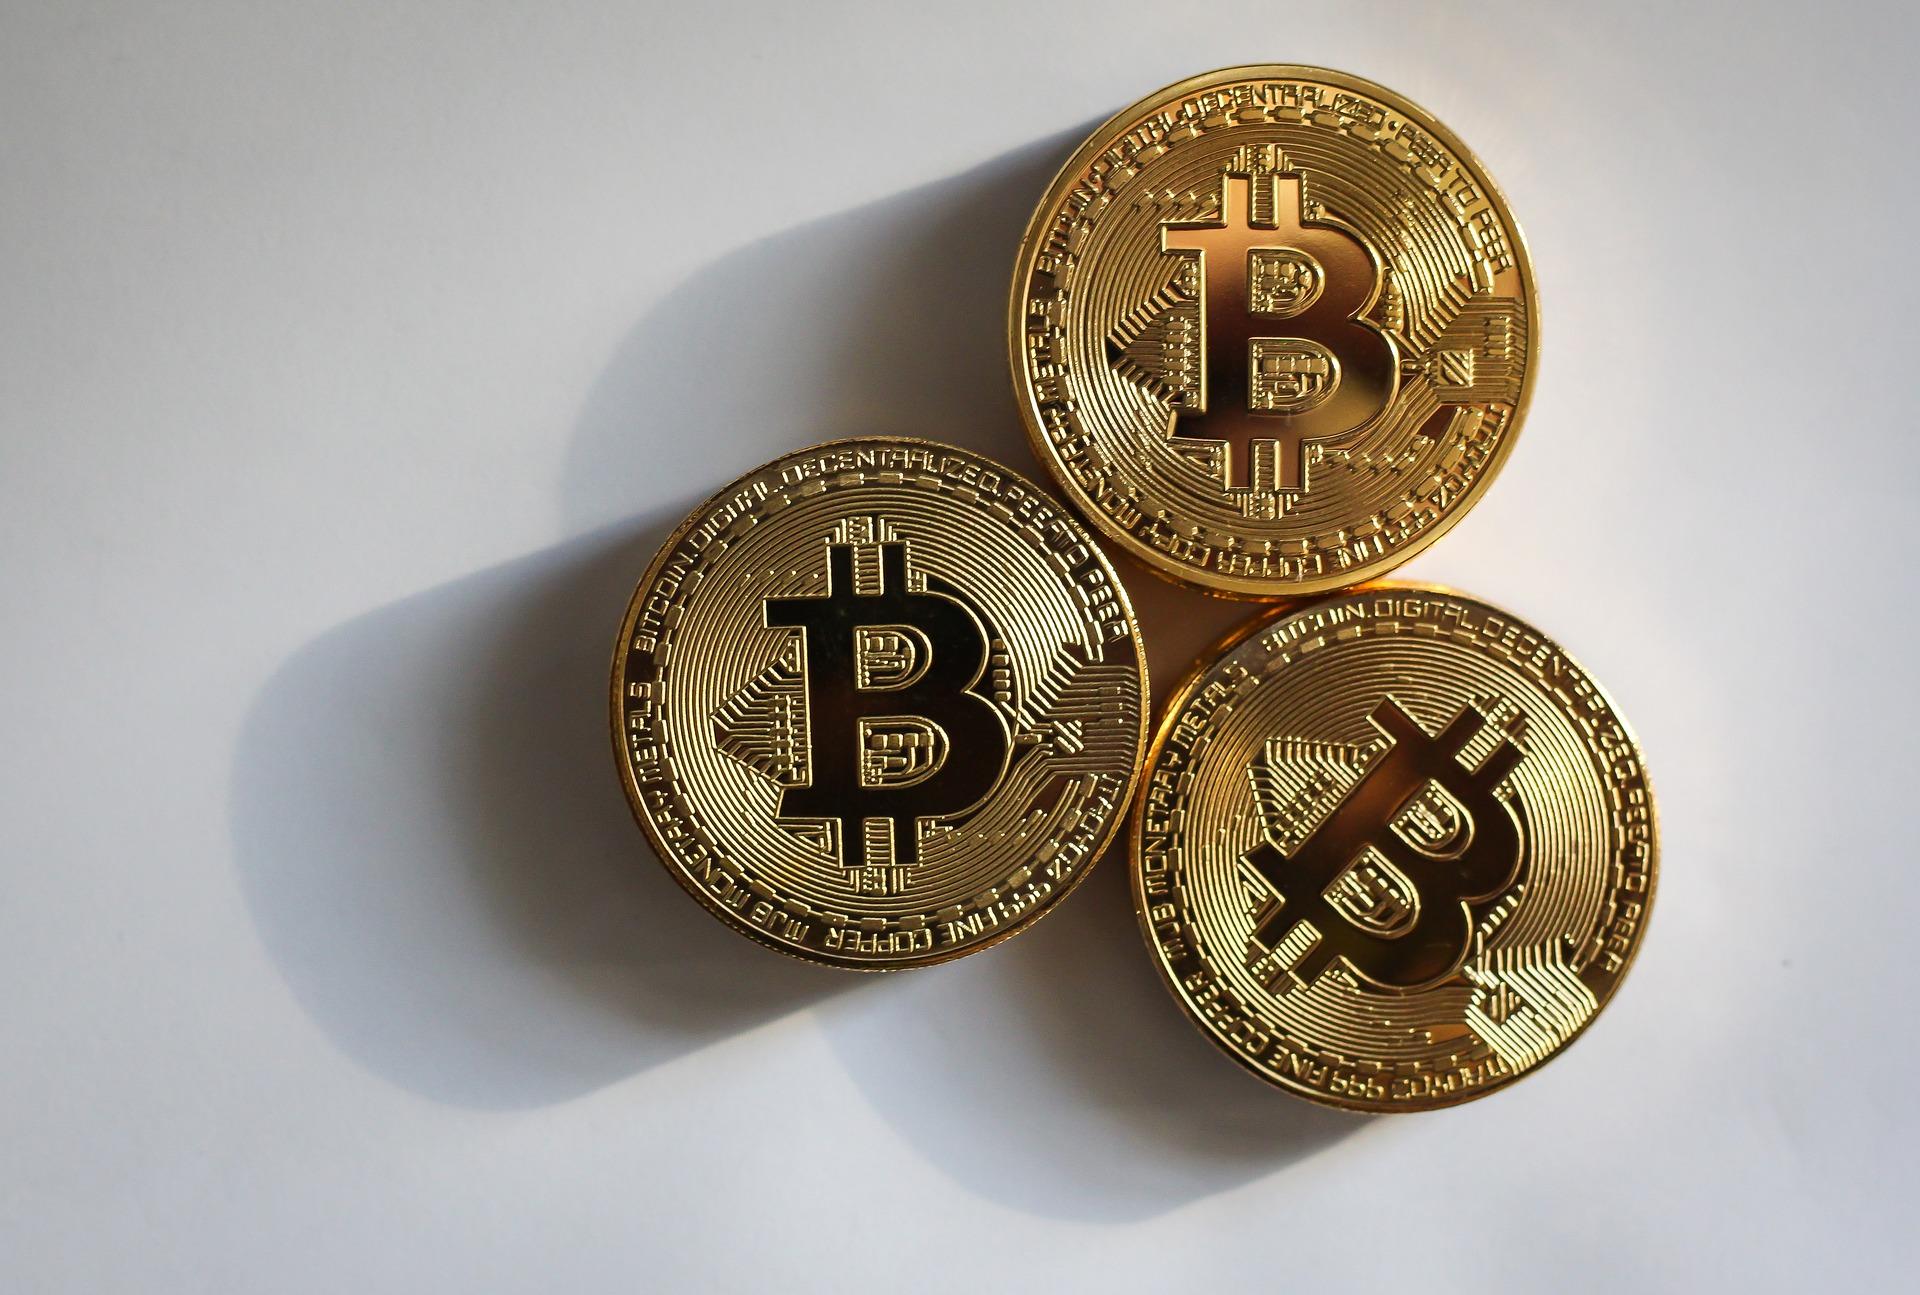 Krypto News - Kryptowährungen